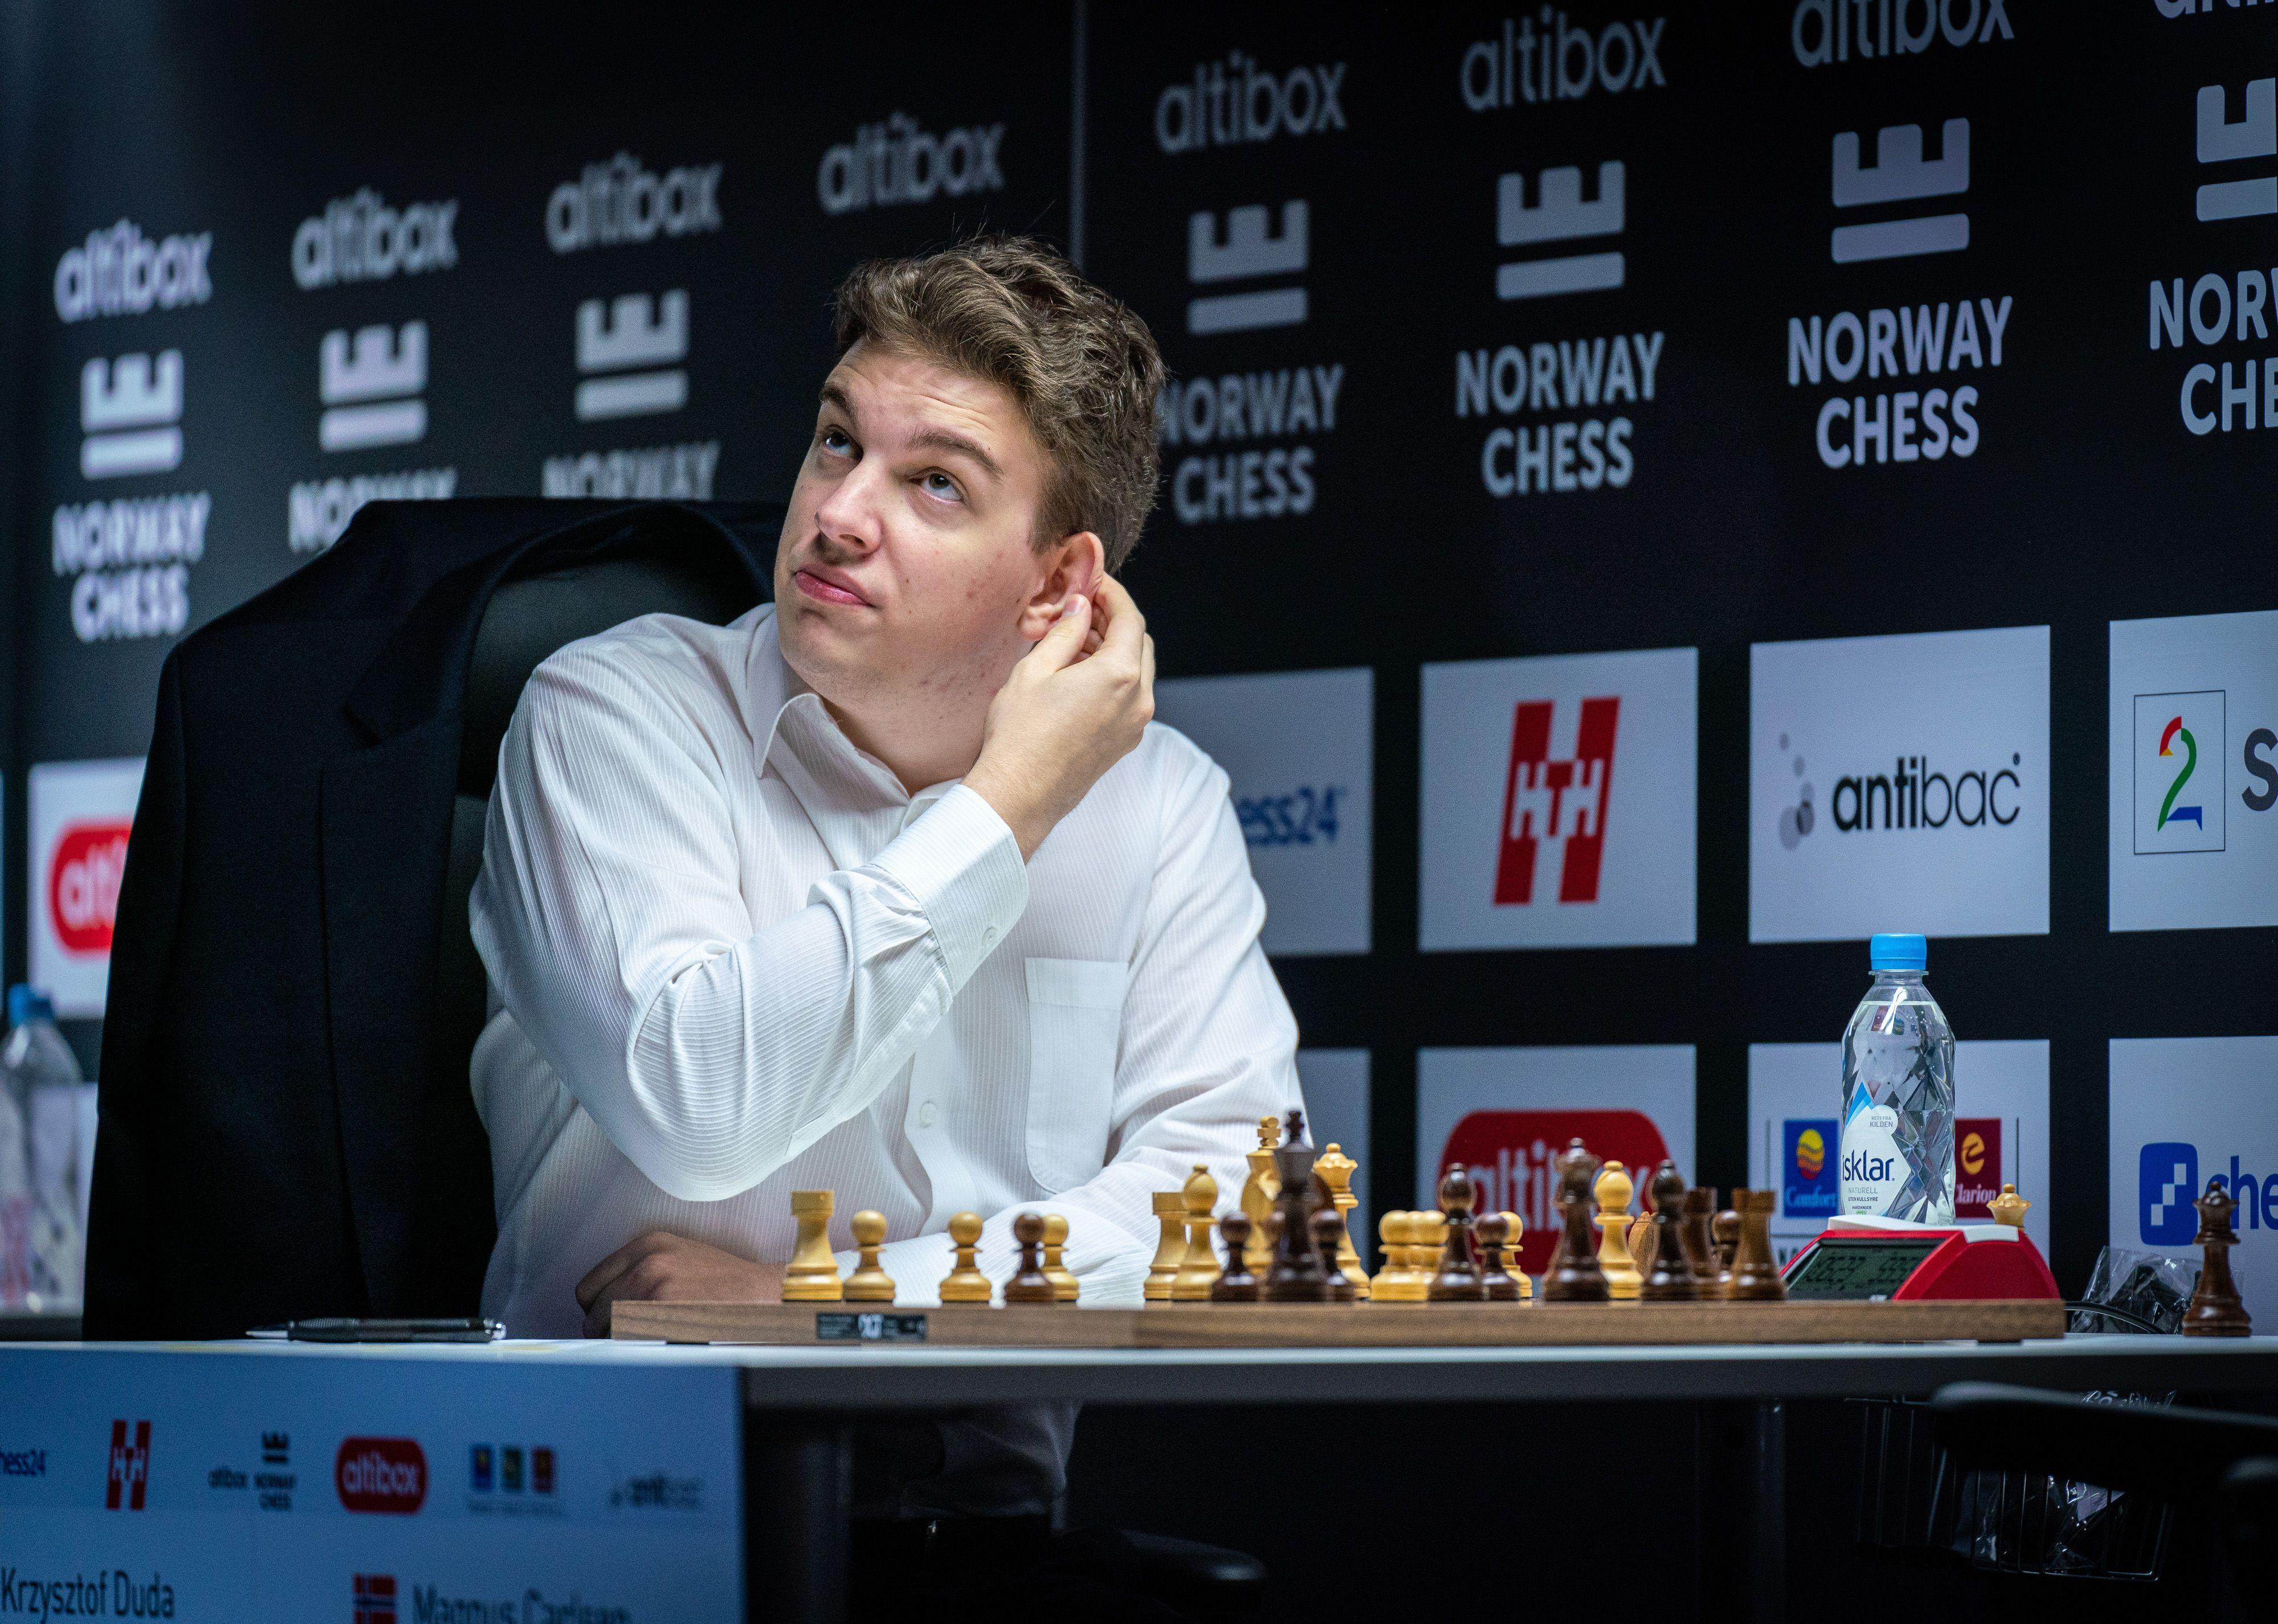 How Carlsen S Blunder To Duda Ended An Amazing Unbeaten Streak Chess Com